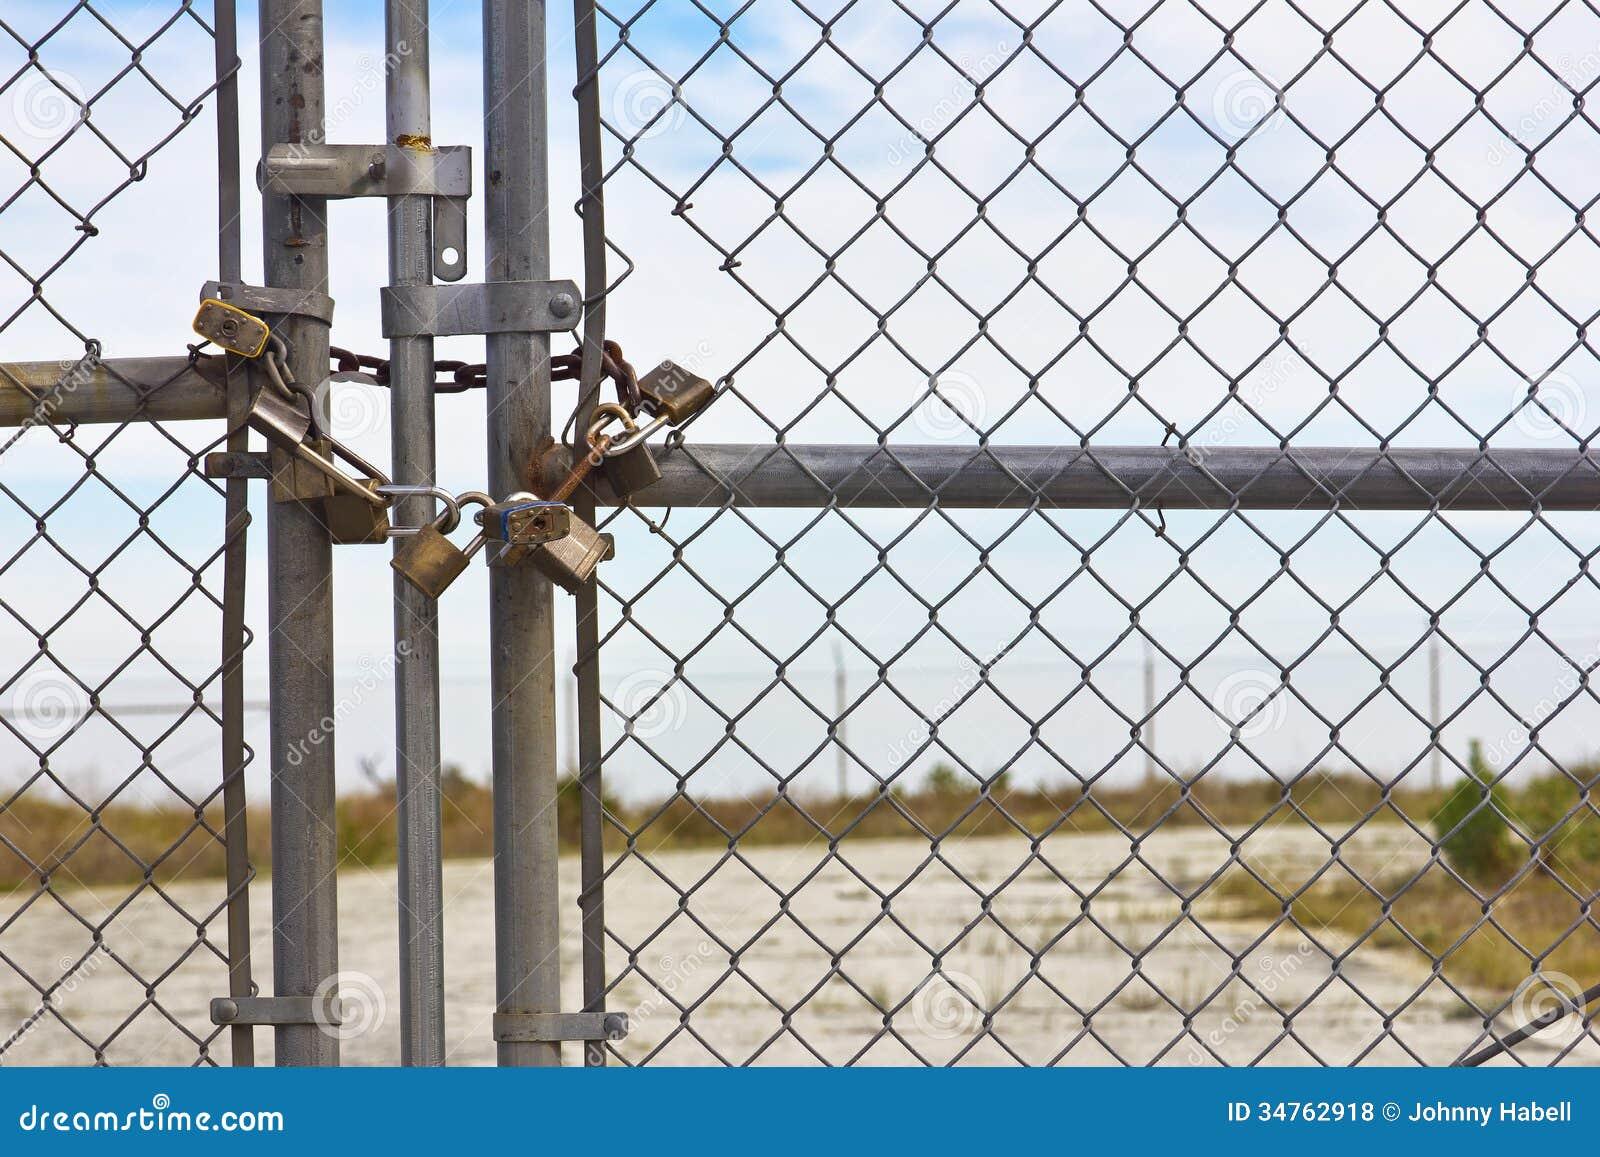 Multiple pad locks stock photo image of cage